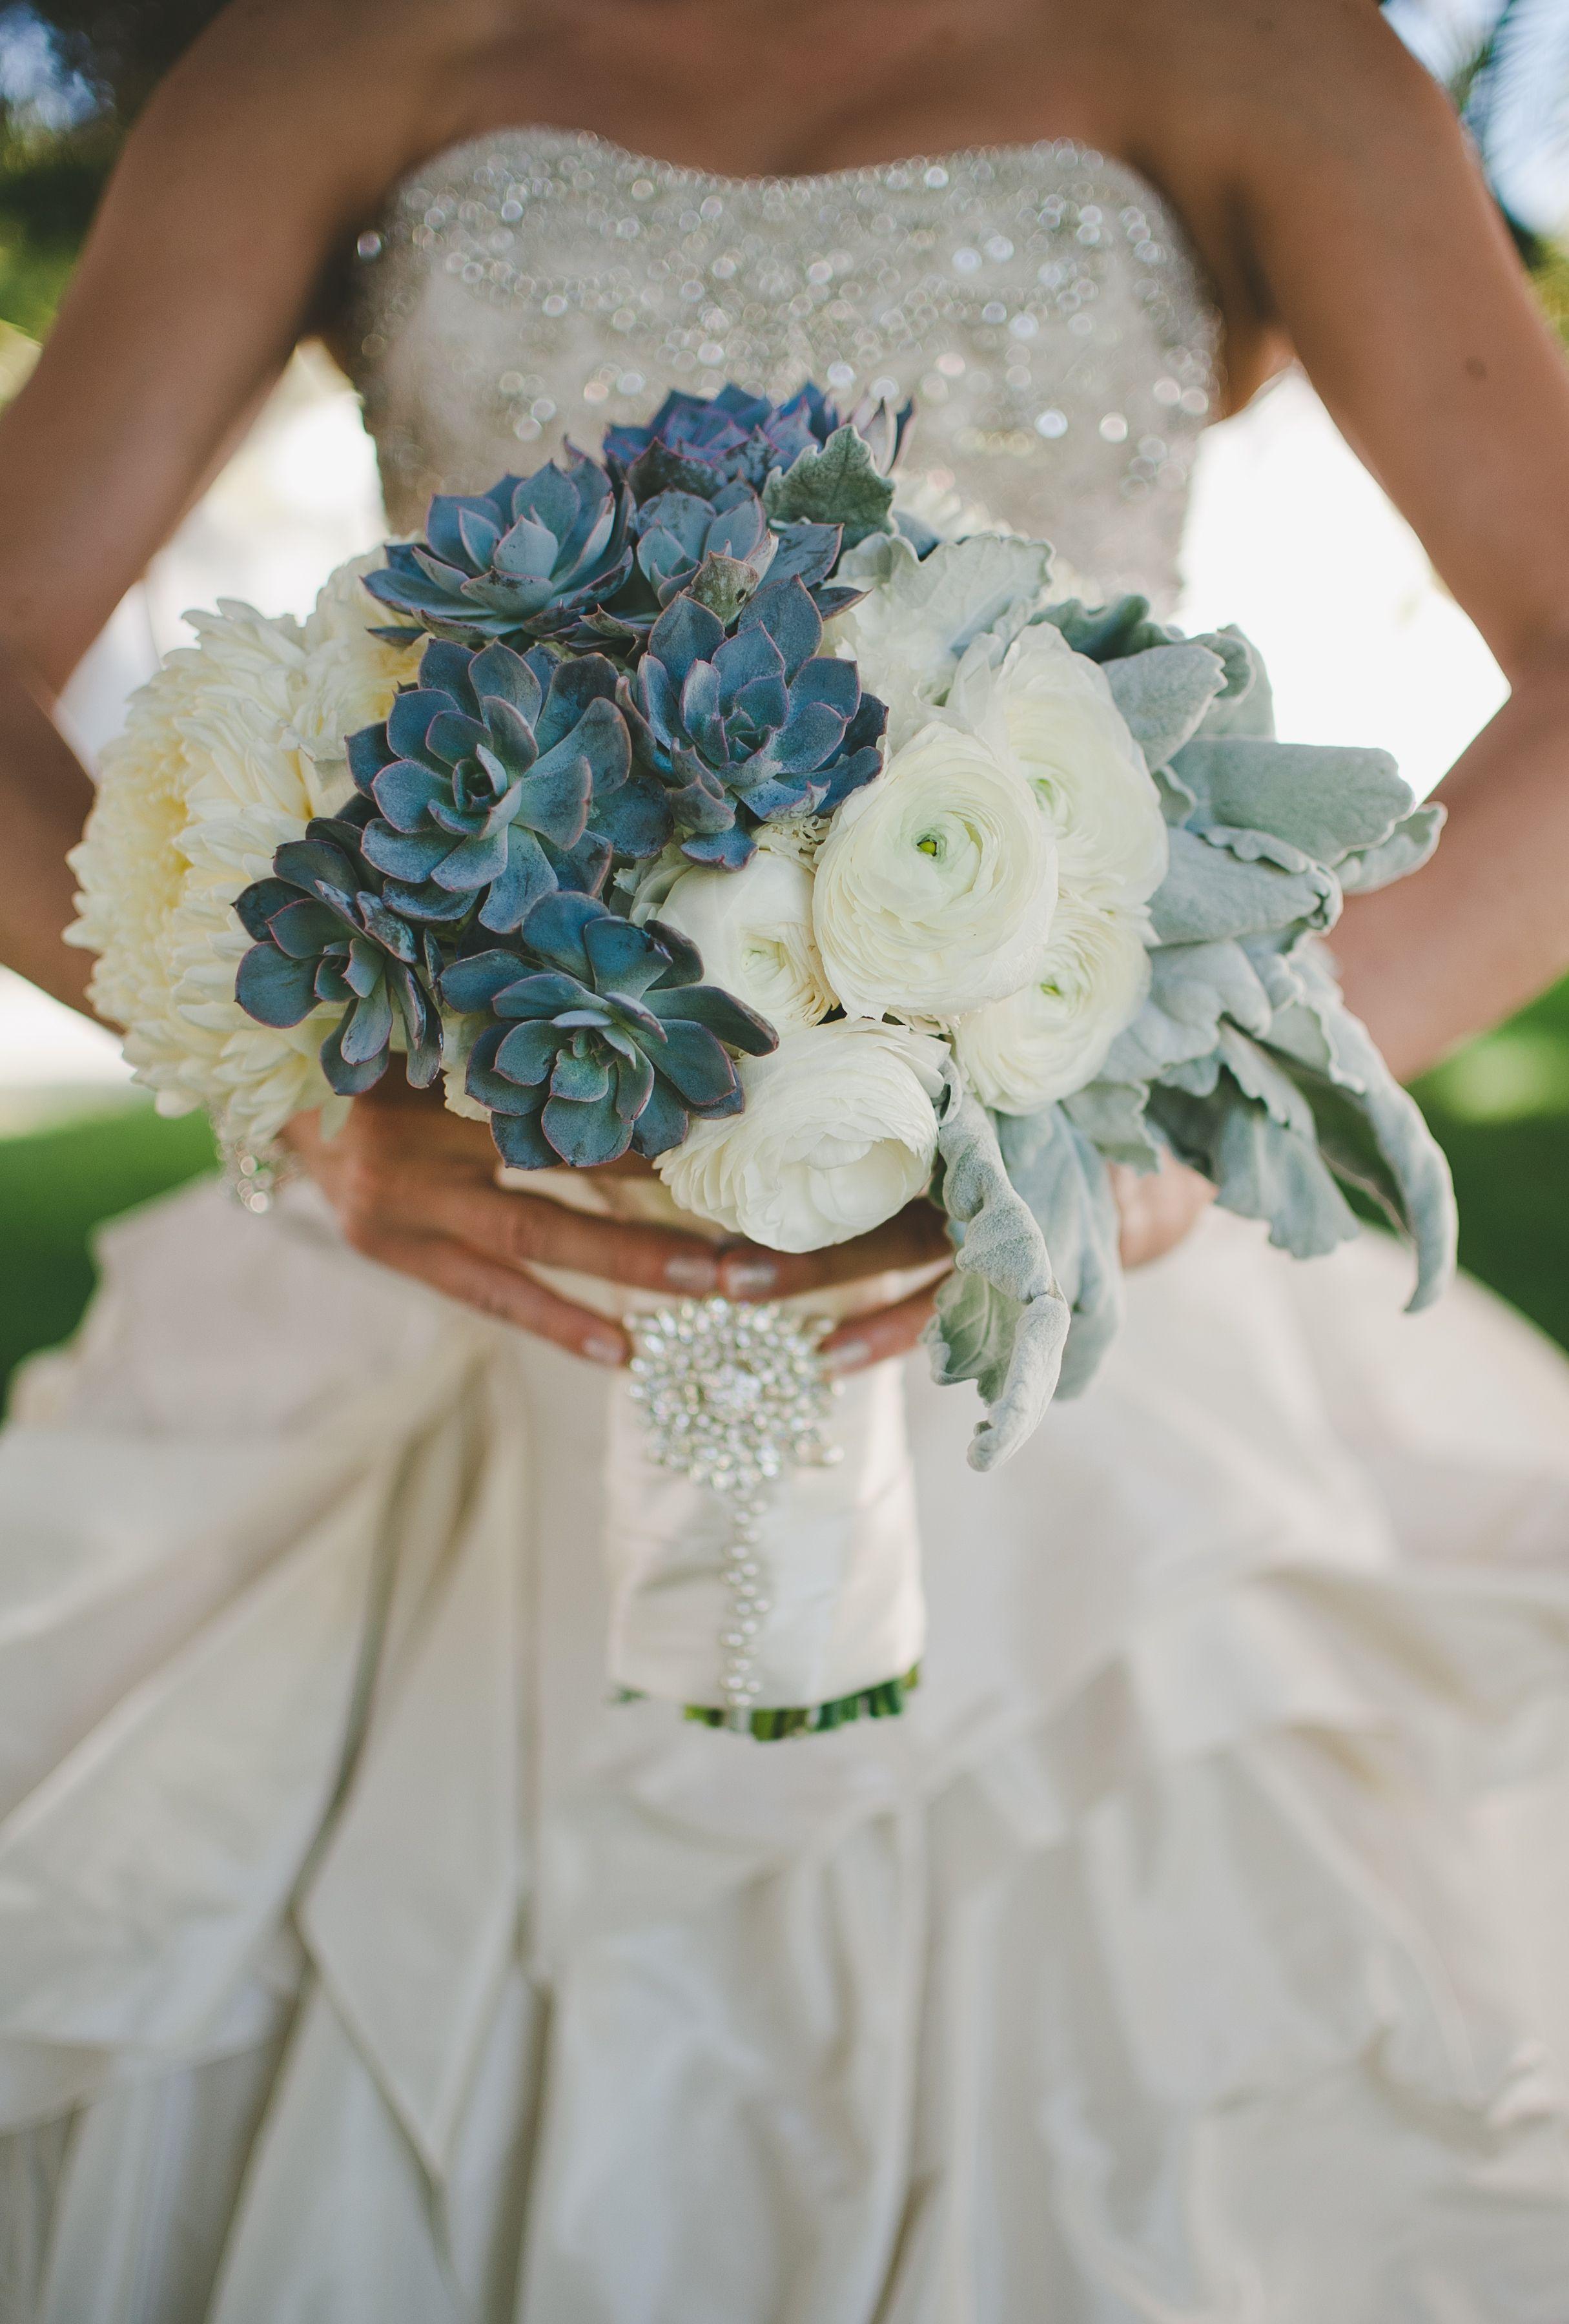 Blush botanicals blushbotanicals textured white and blue